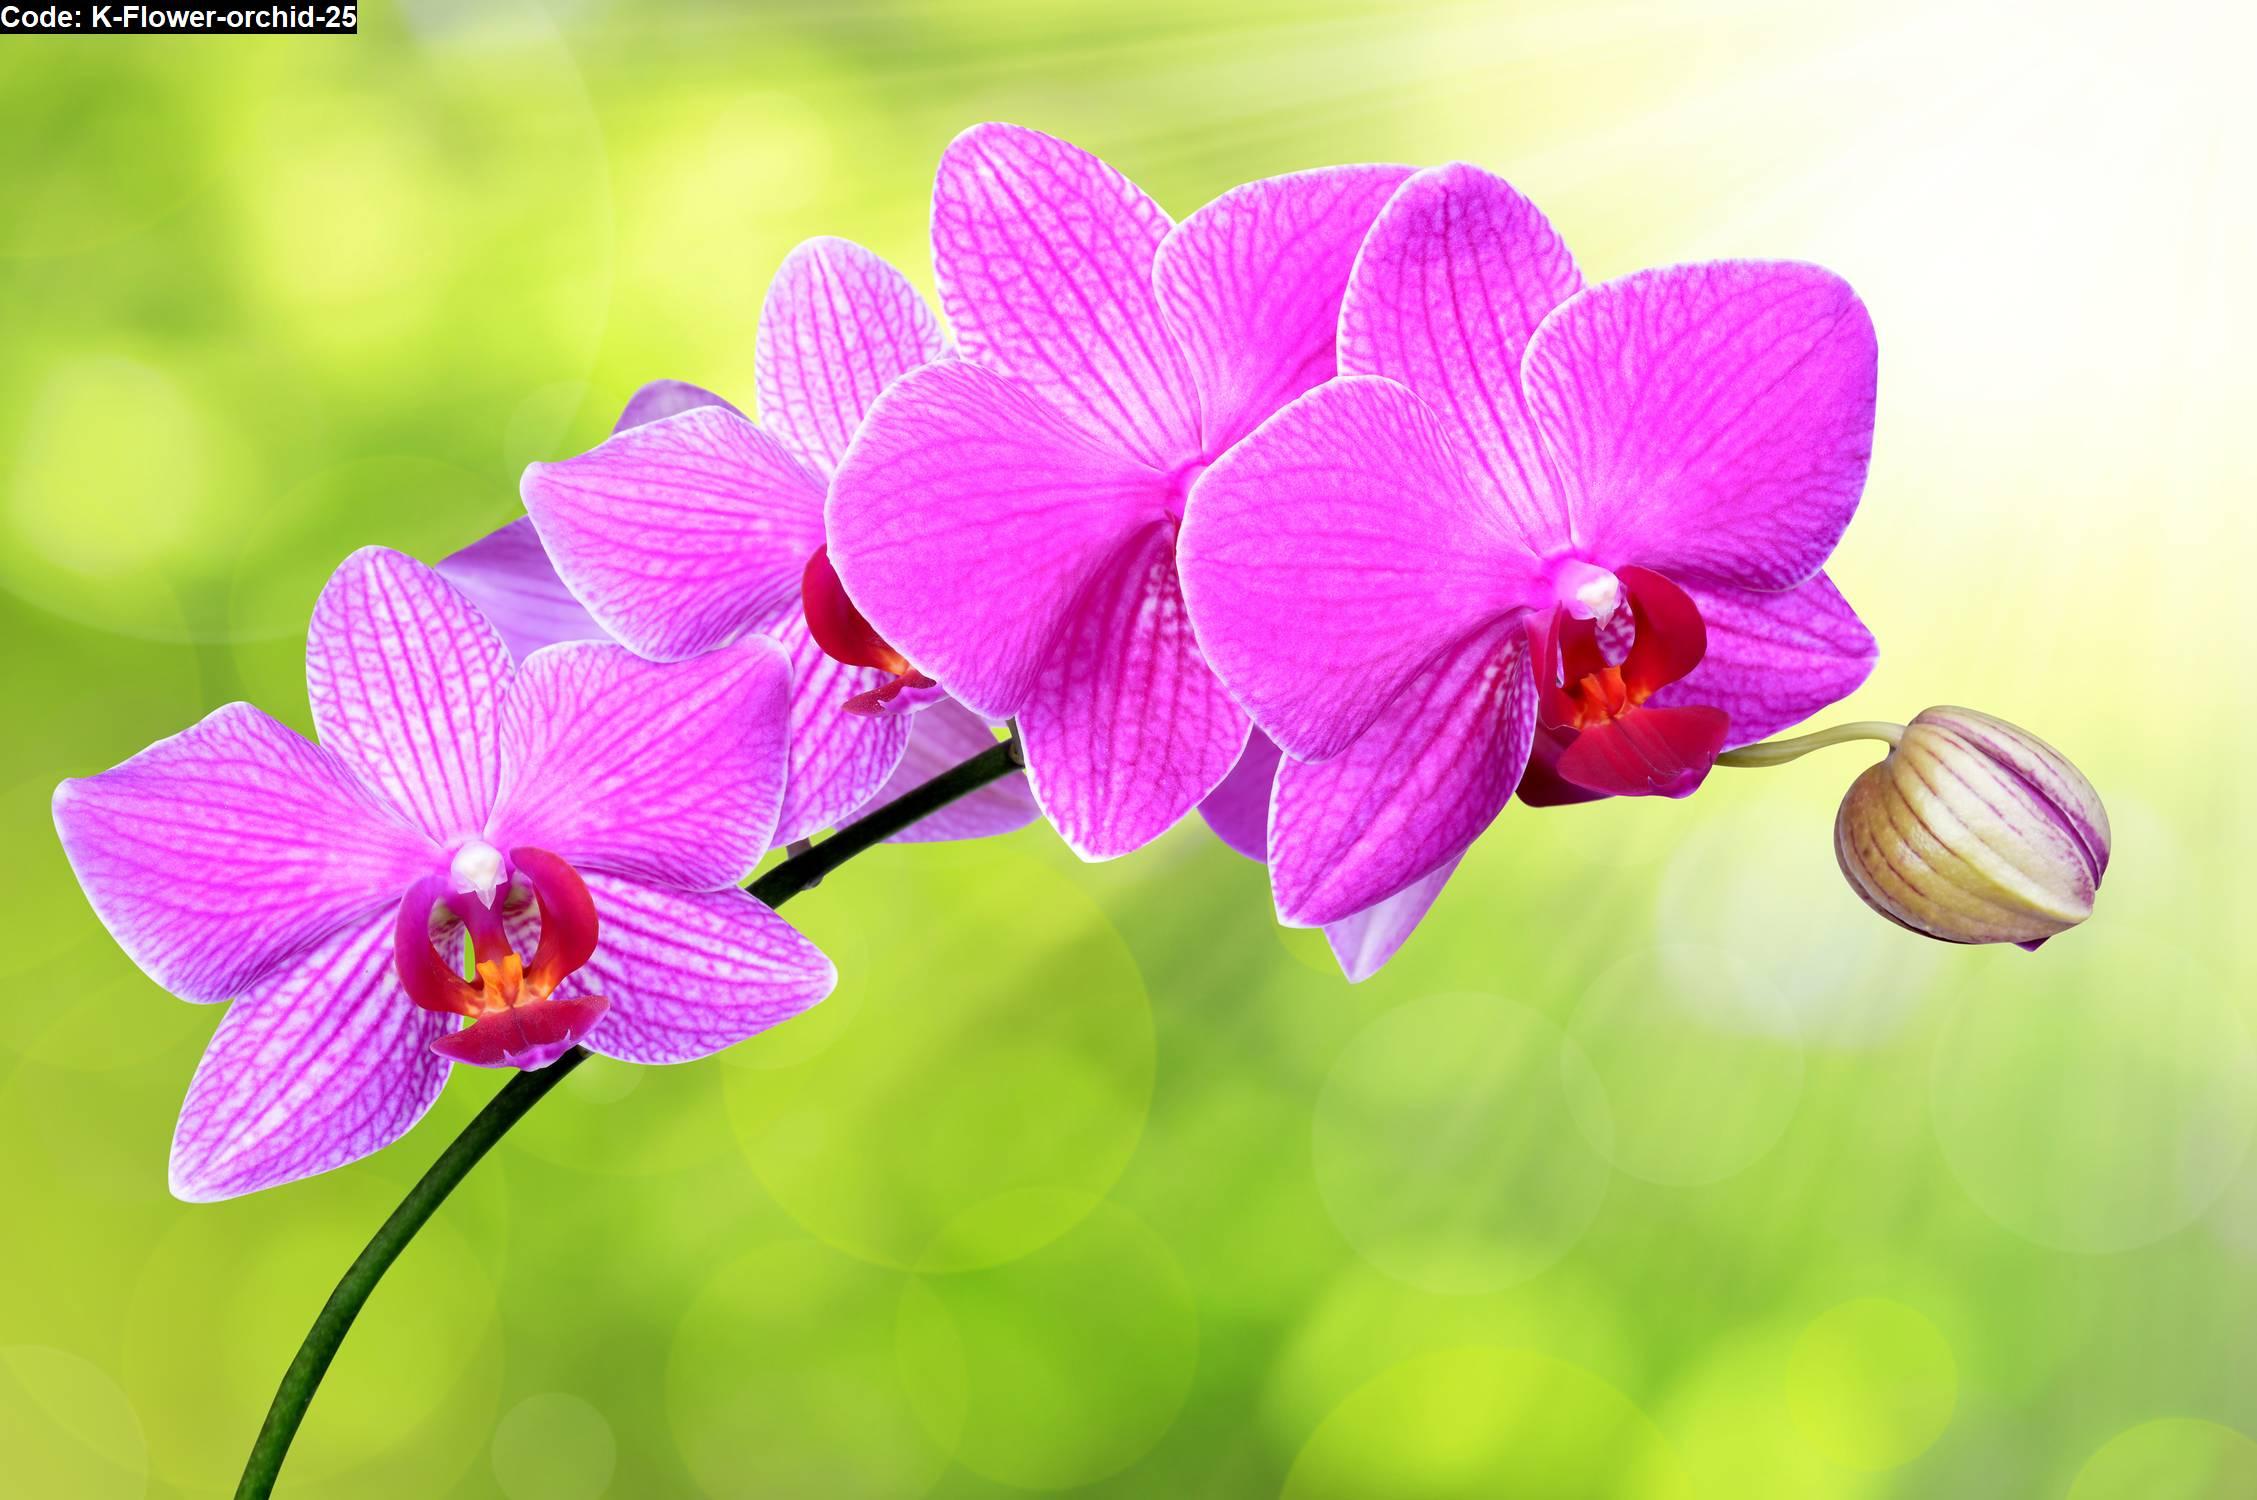 Flower Orchid 25 Jual Hiasan Dinding